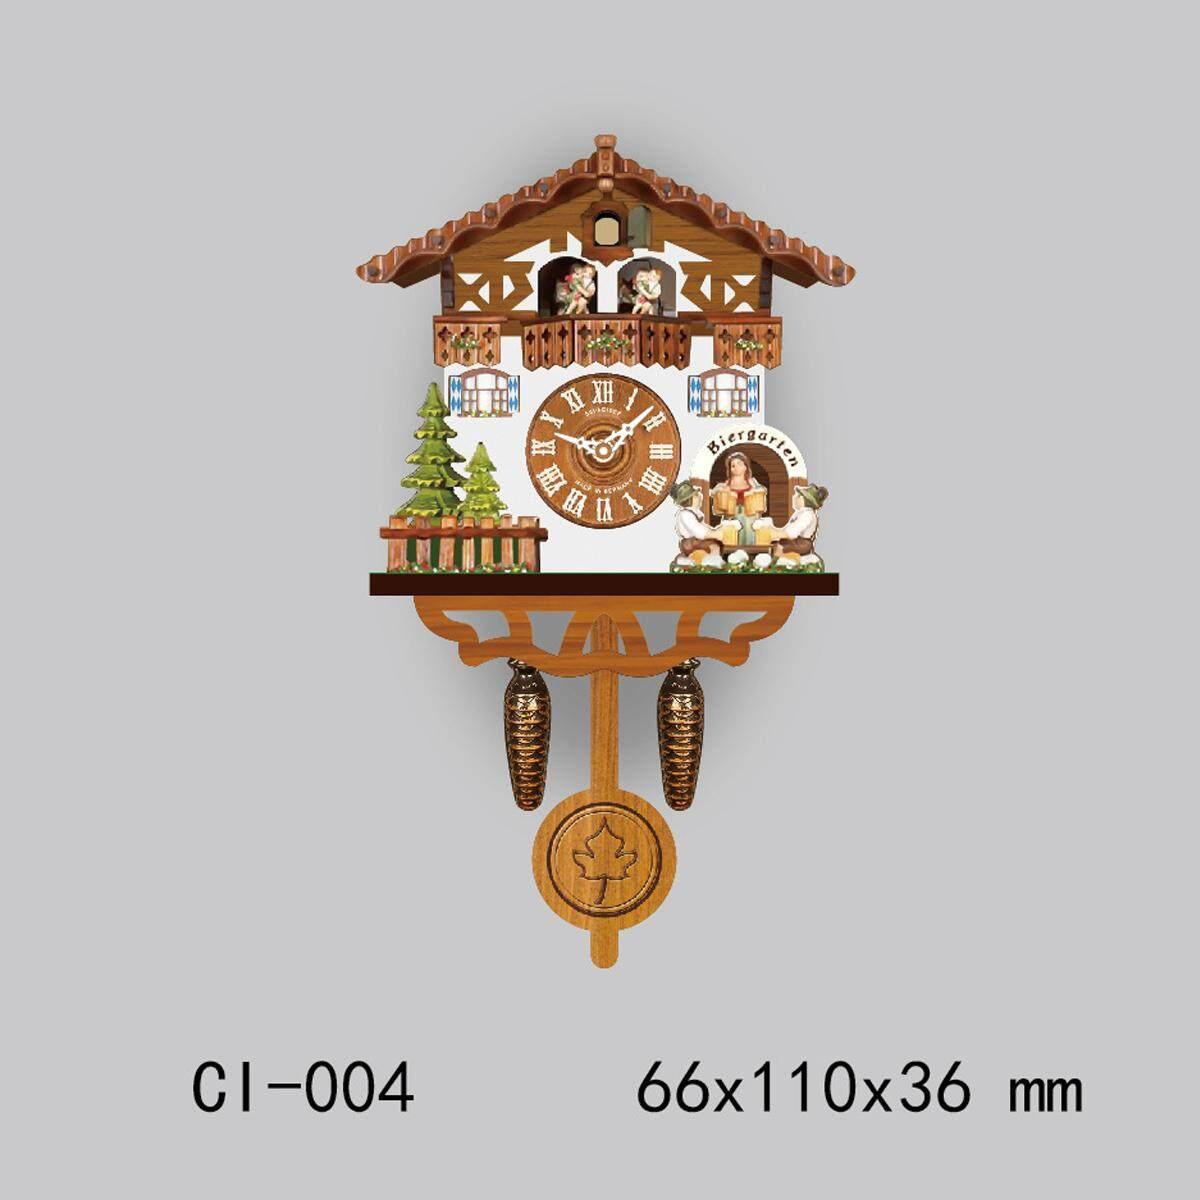 Europea Cuckoo Clock House wall clock large modern art vintage home decor